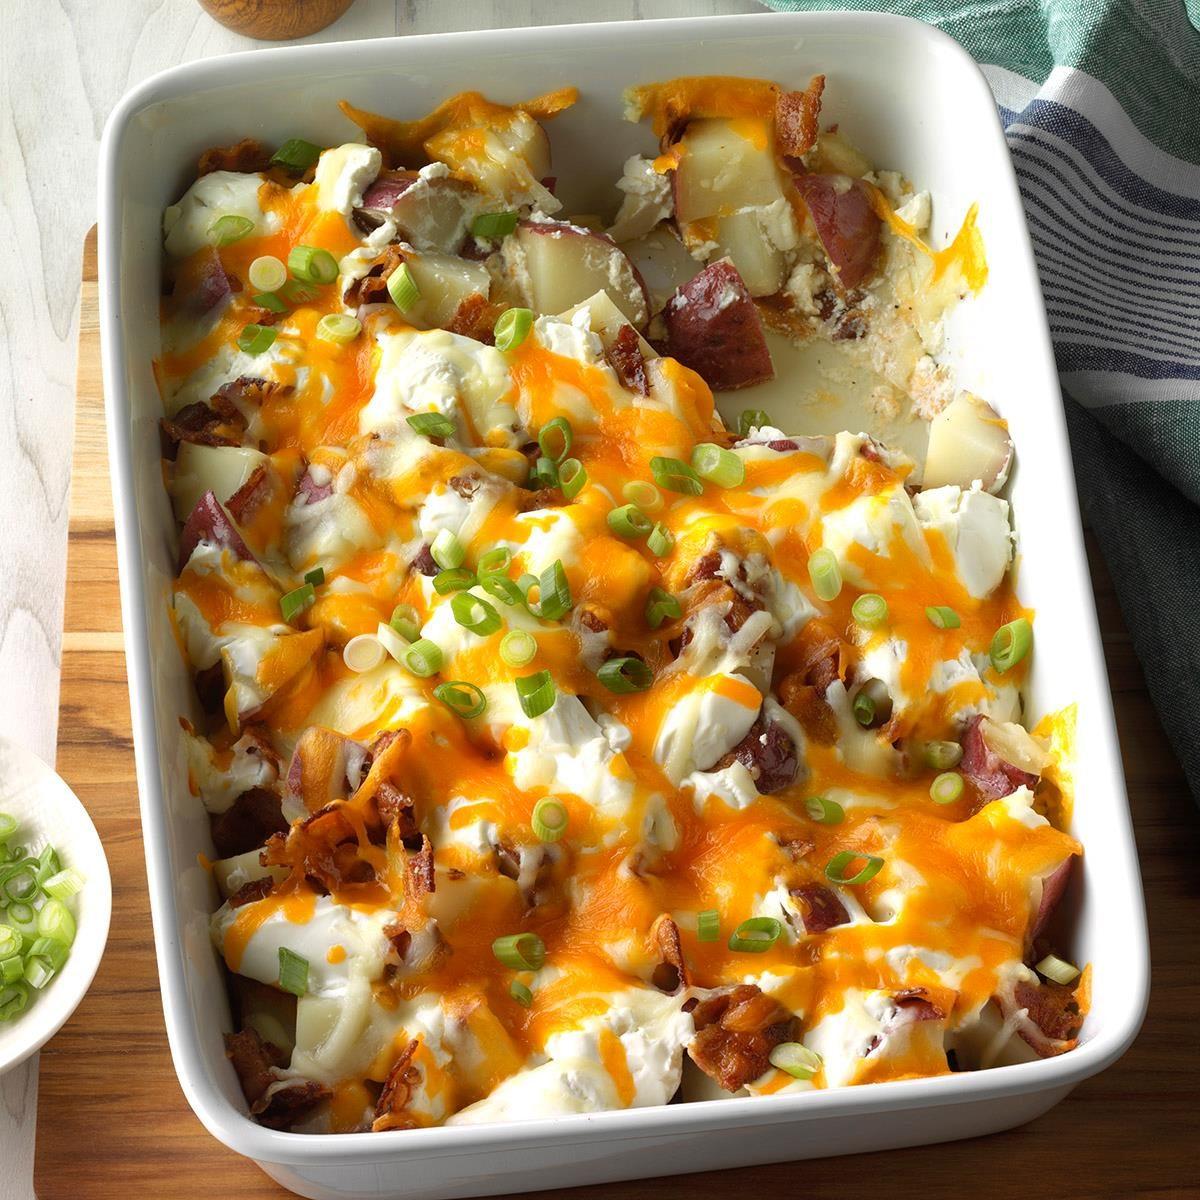 Ohio: Twice-Baked Potato Casserole